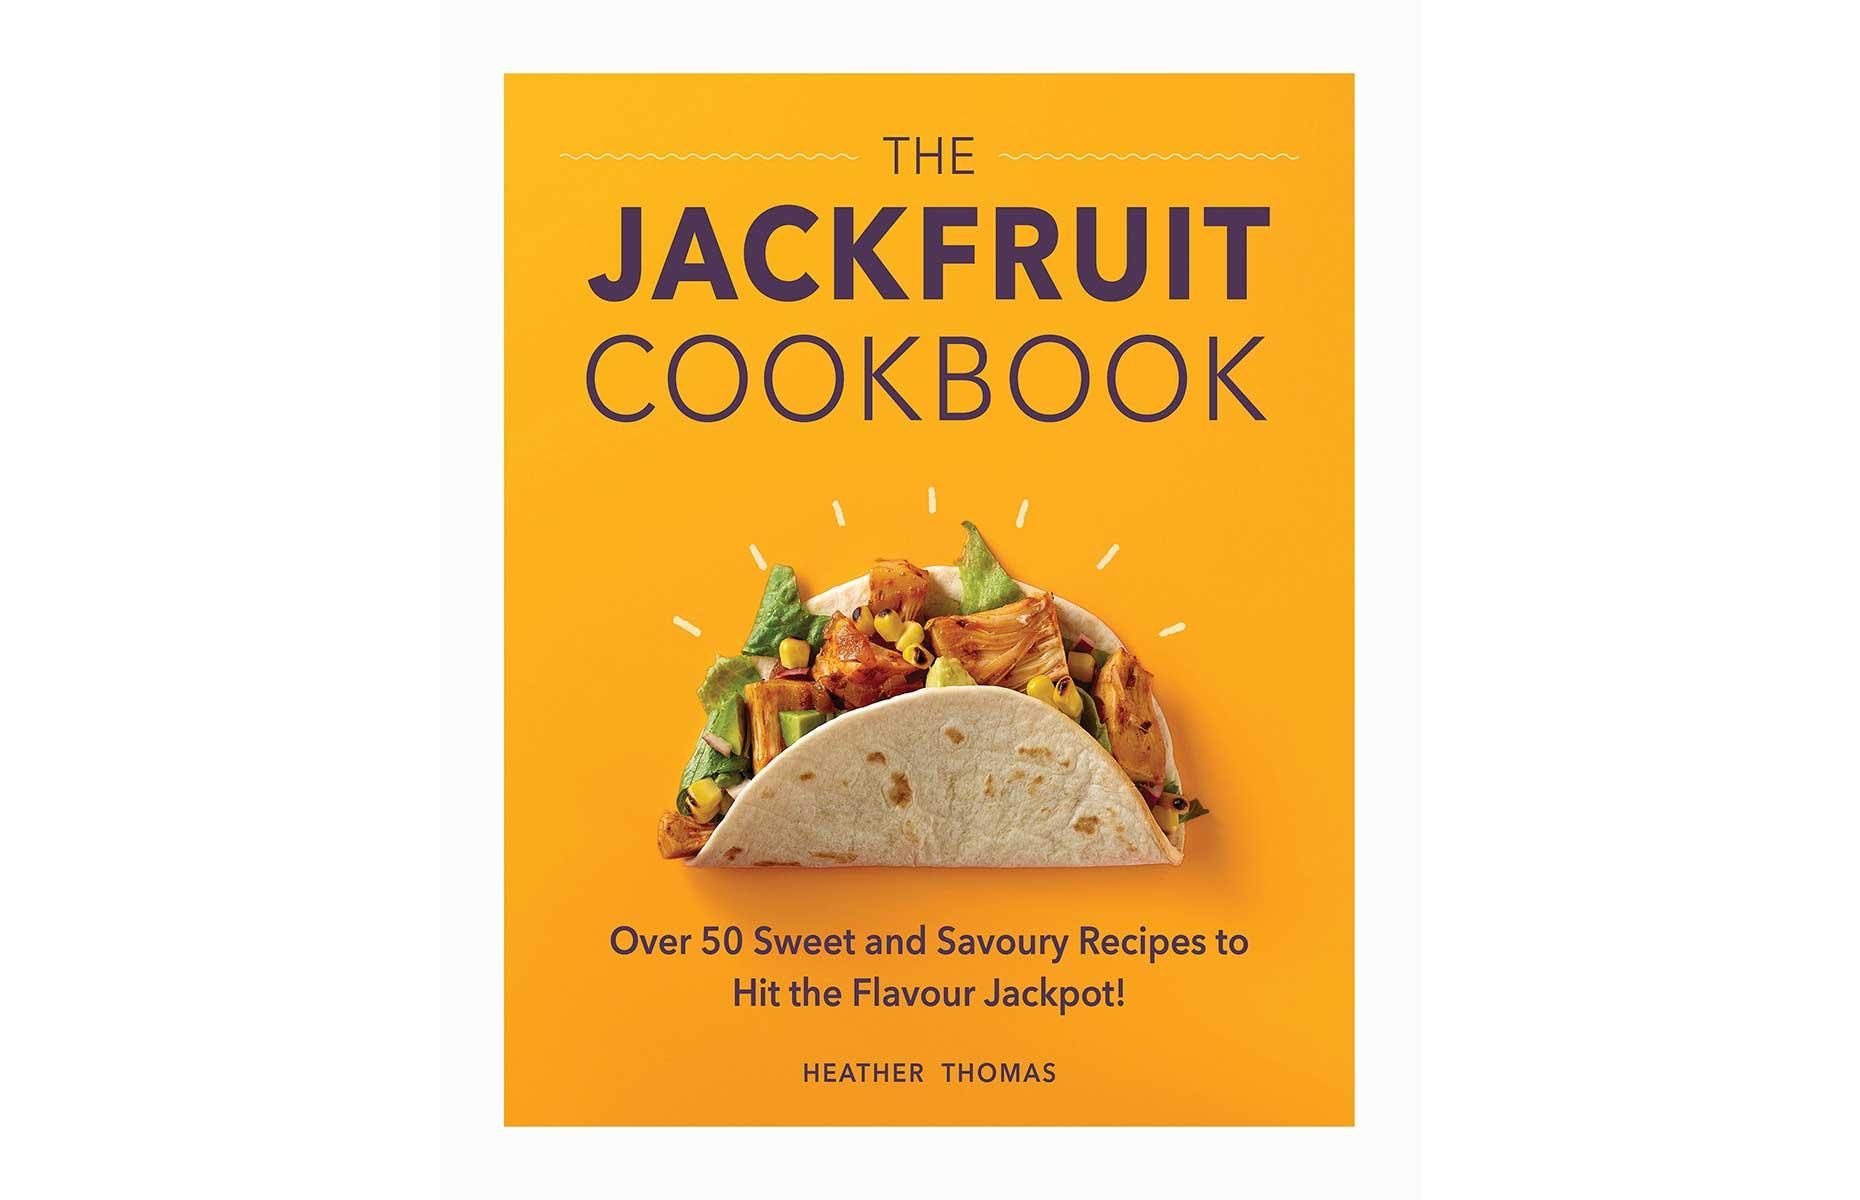 The Jackfruit Cookbook (Image: The Jackfruit Cookbook)